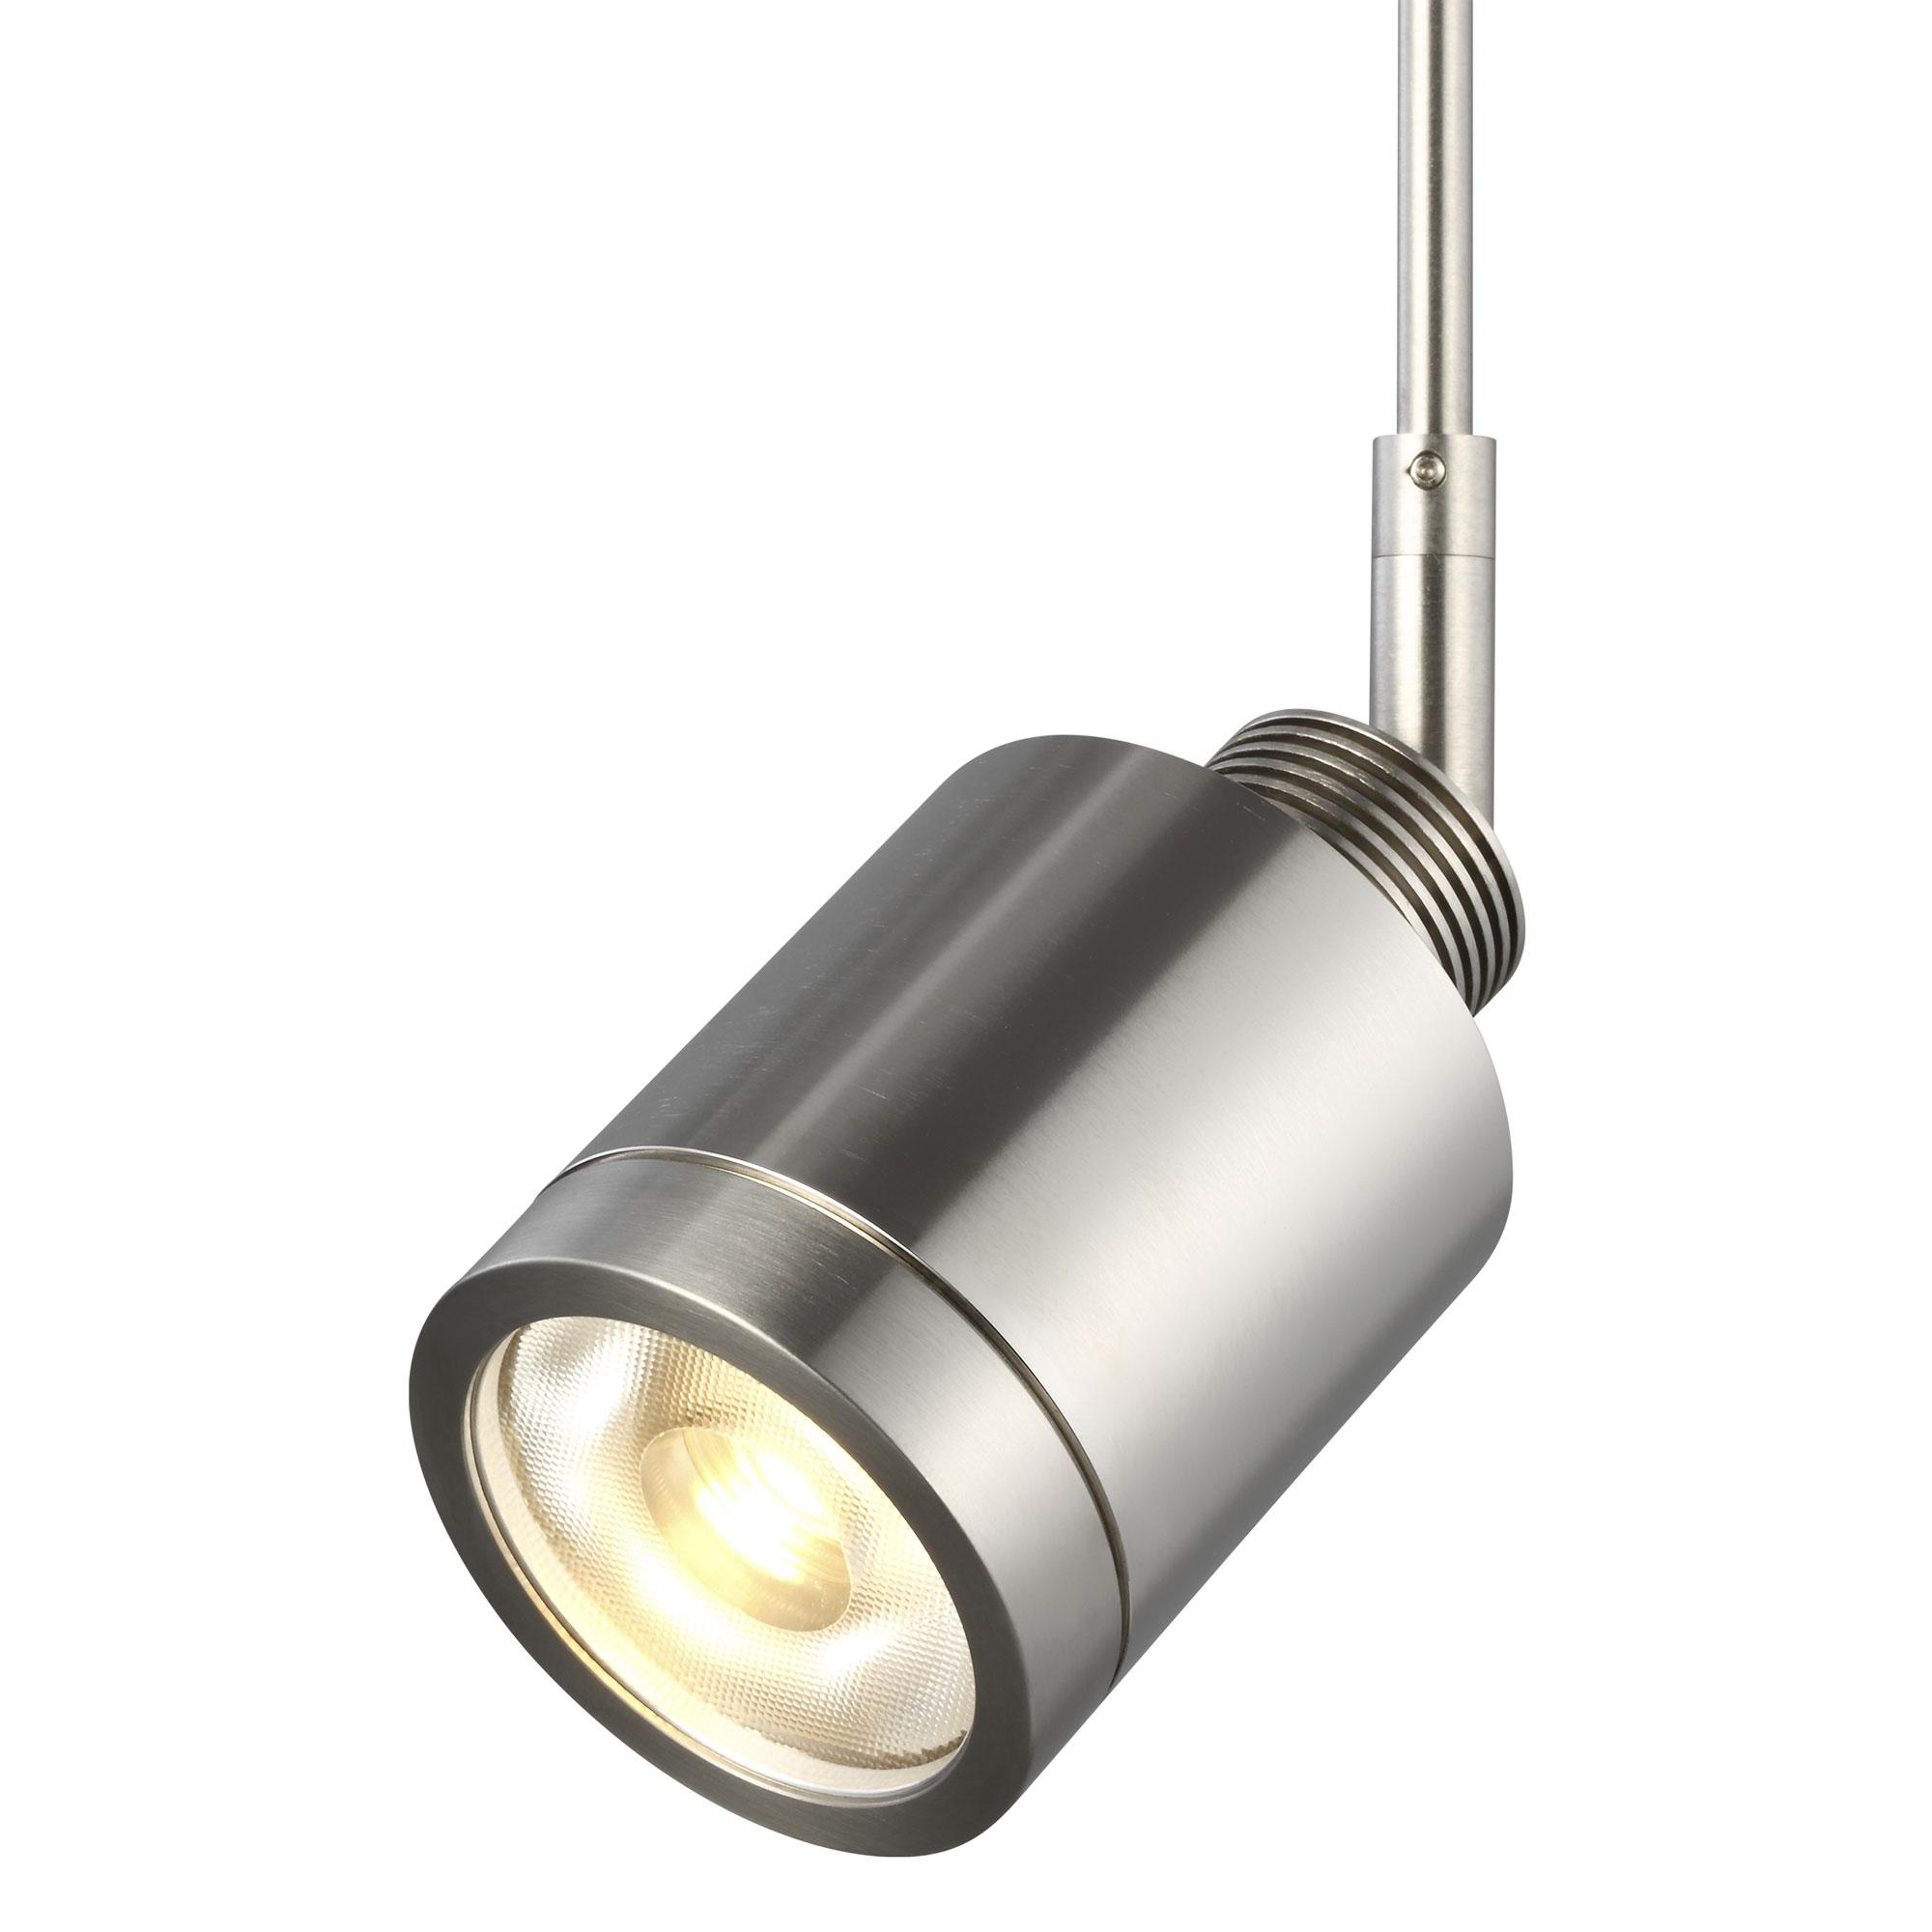 Tellium monorail 2 circuit led head by tech lighting